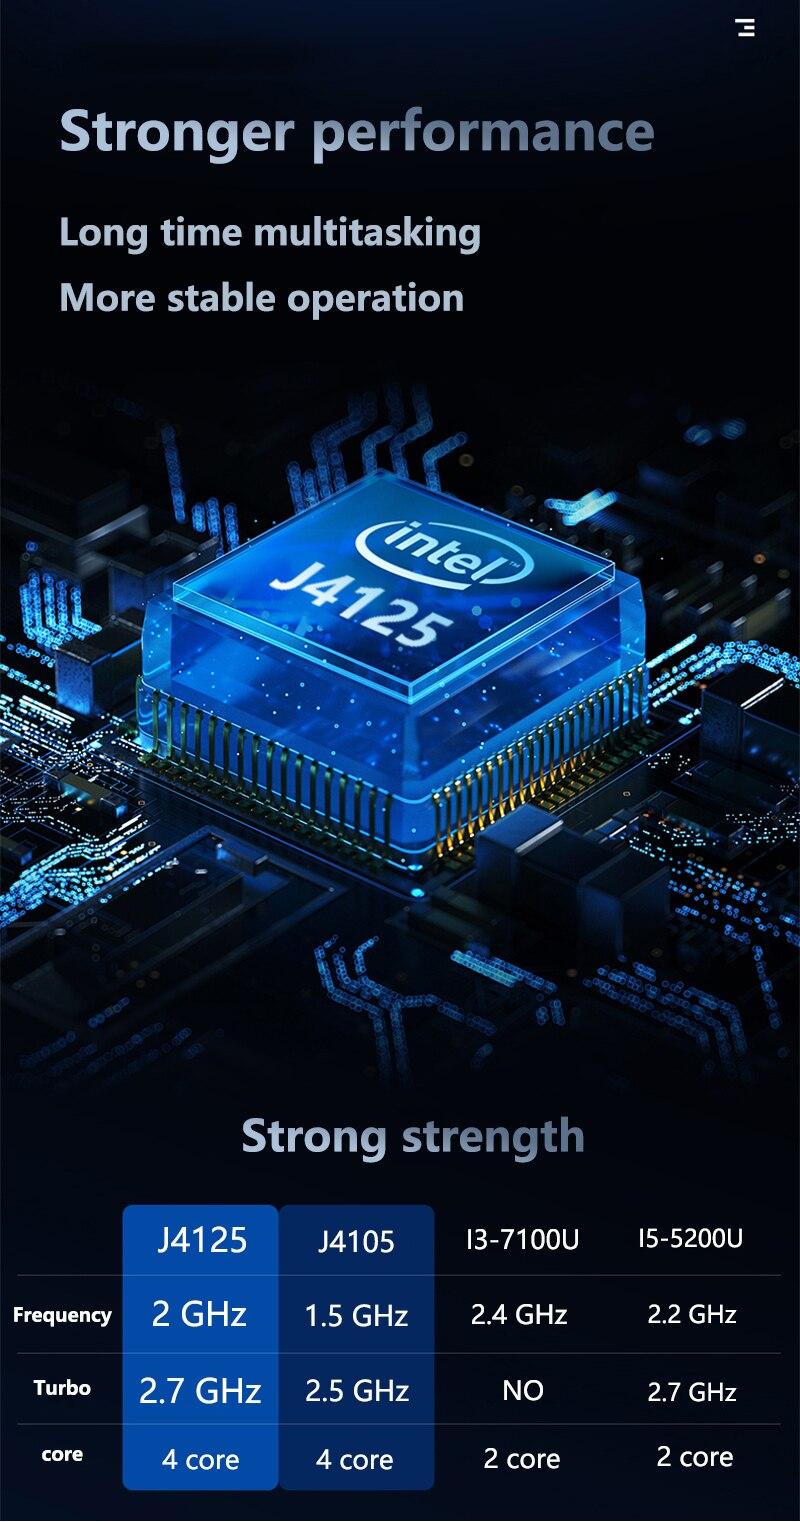 Cheap Notebook 15.6 inch FHD  Intel Celeron J4125 8GB DDR4 256GB SSD Windows 10 Ultrabook PC Portable Gamer School notebooks